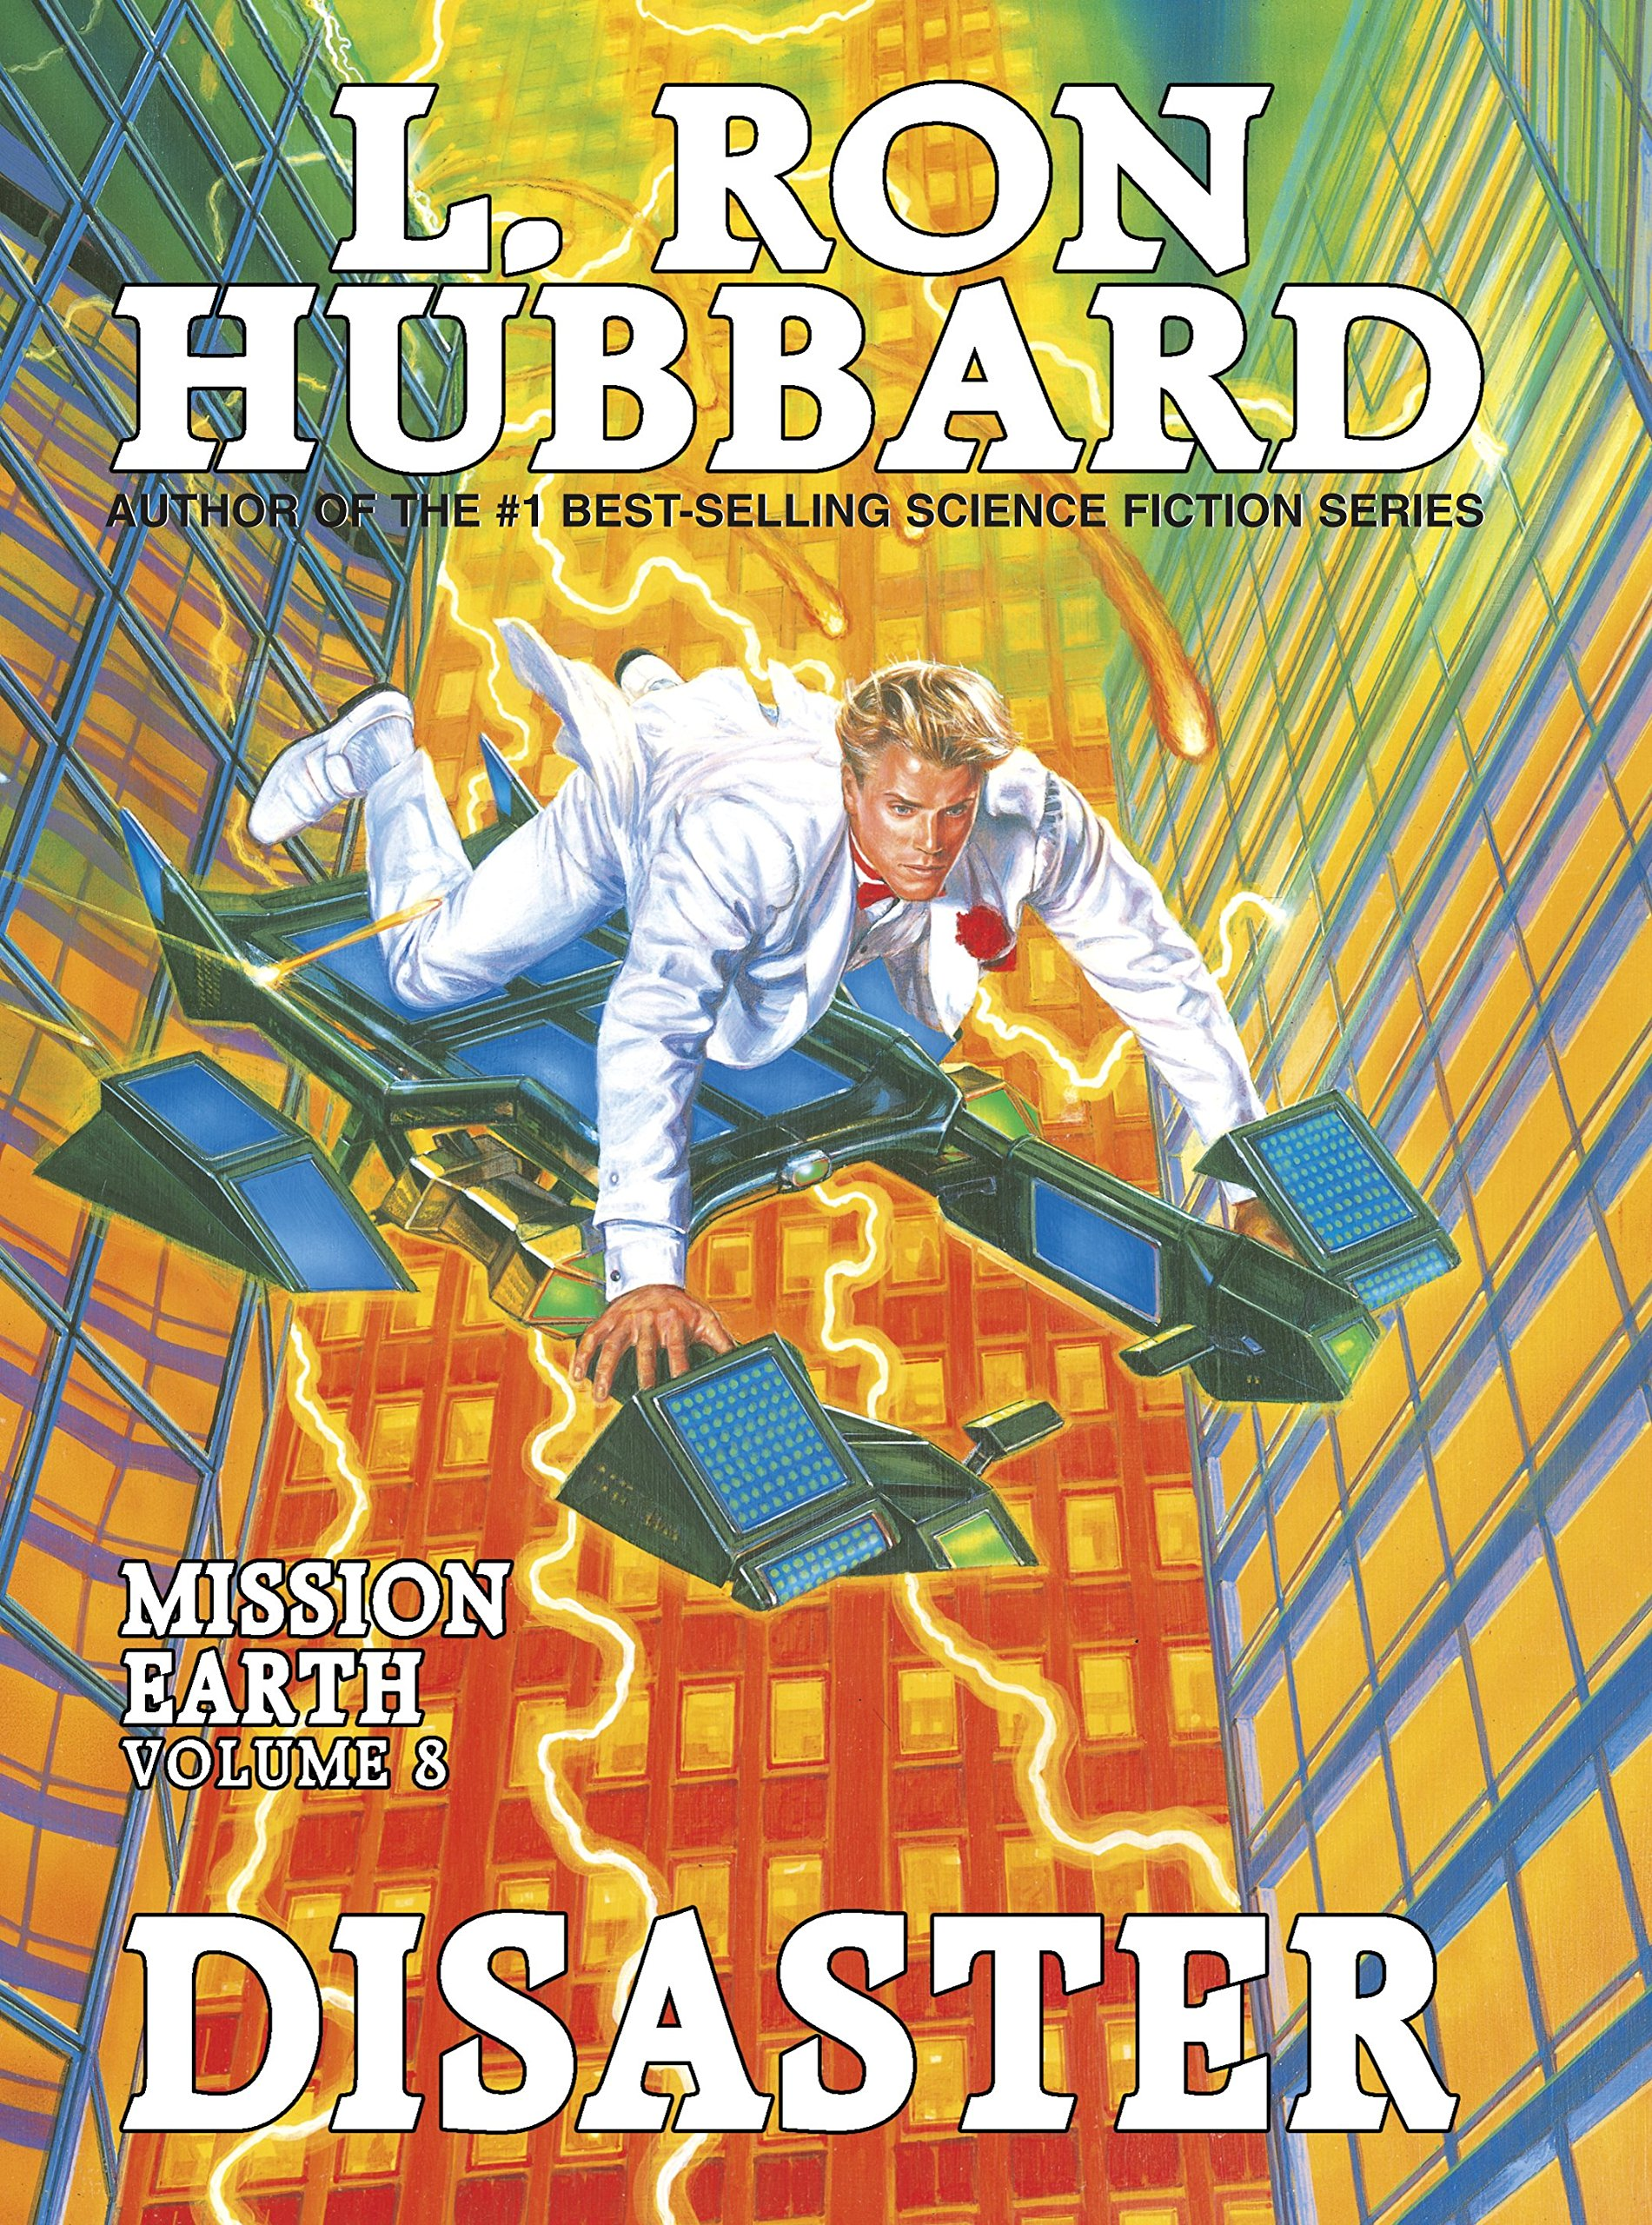 Mission Earth 8, Disaster: Amazon.es: Hubbard, L Ron: Libros ...